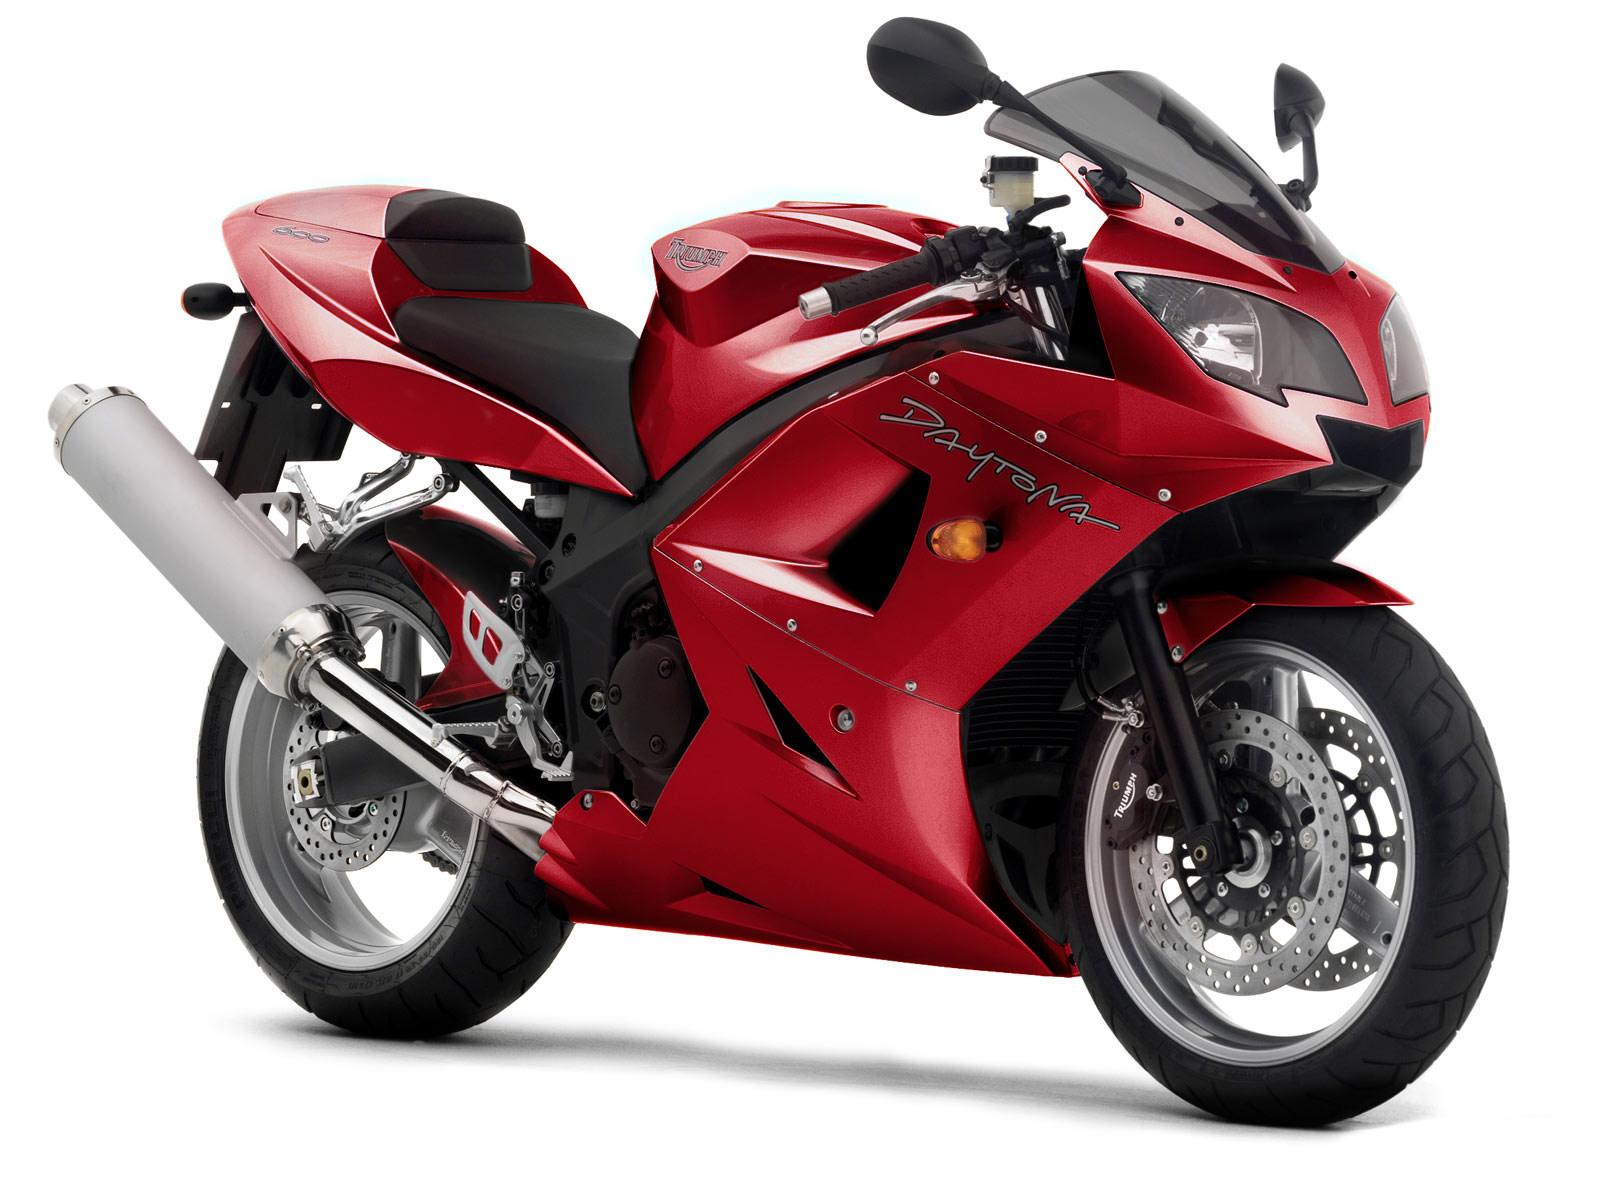 2004 Triumph Daytona 600 Accident Lawyers Info Motorcycle